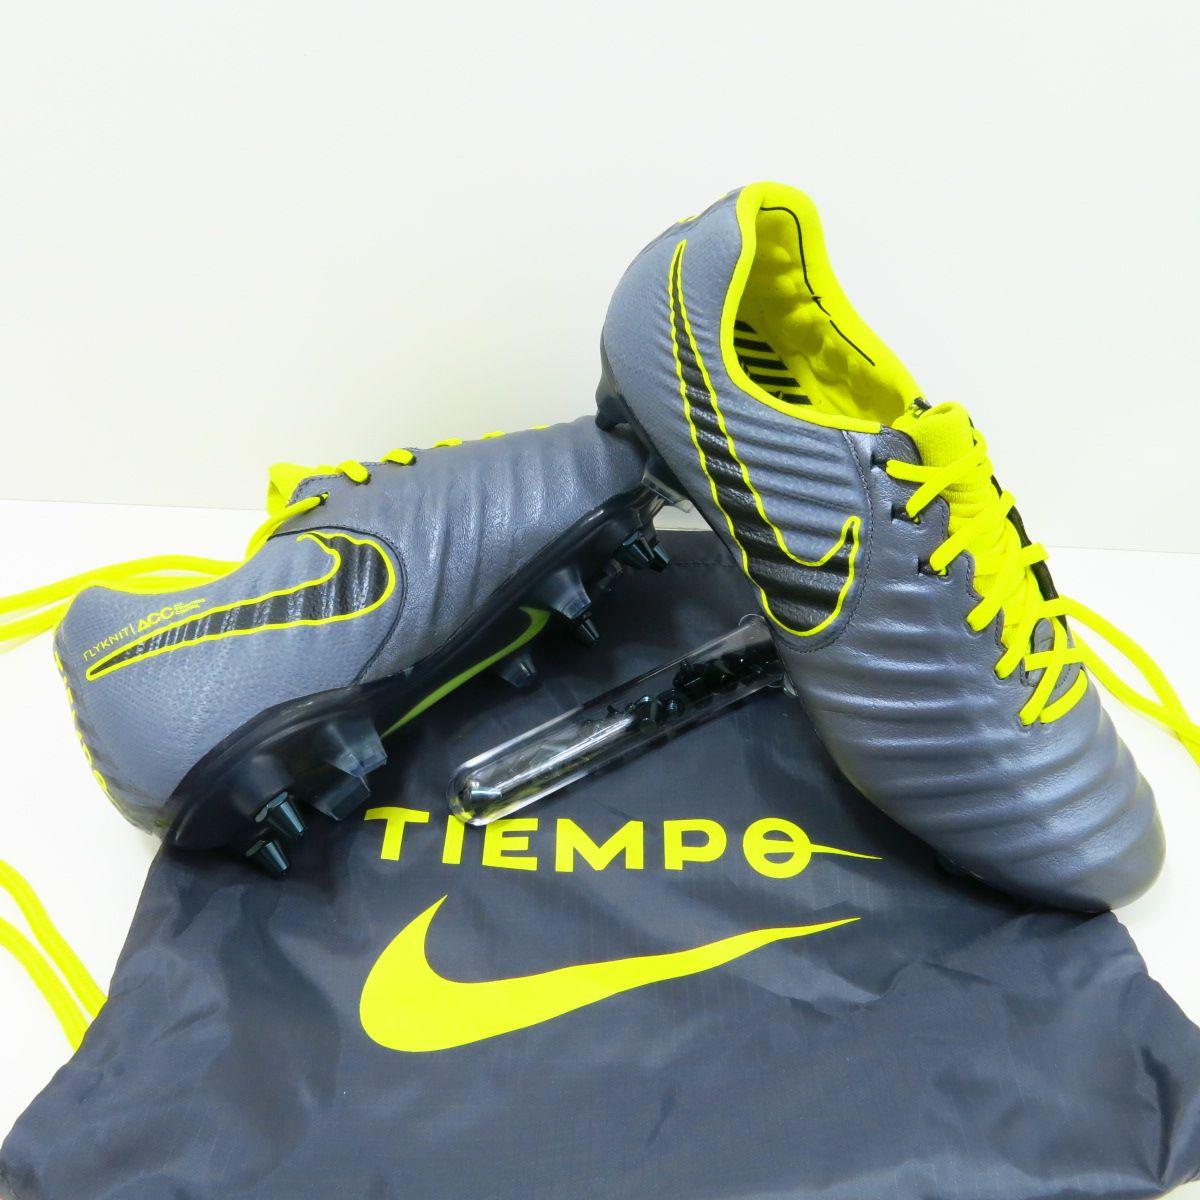 Chuteira Nike Tiempo Legend 7 Elite SG Trava Mista - Couro de Canguru